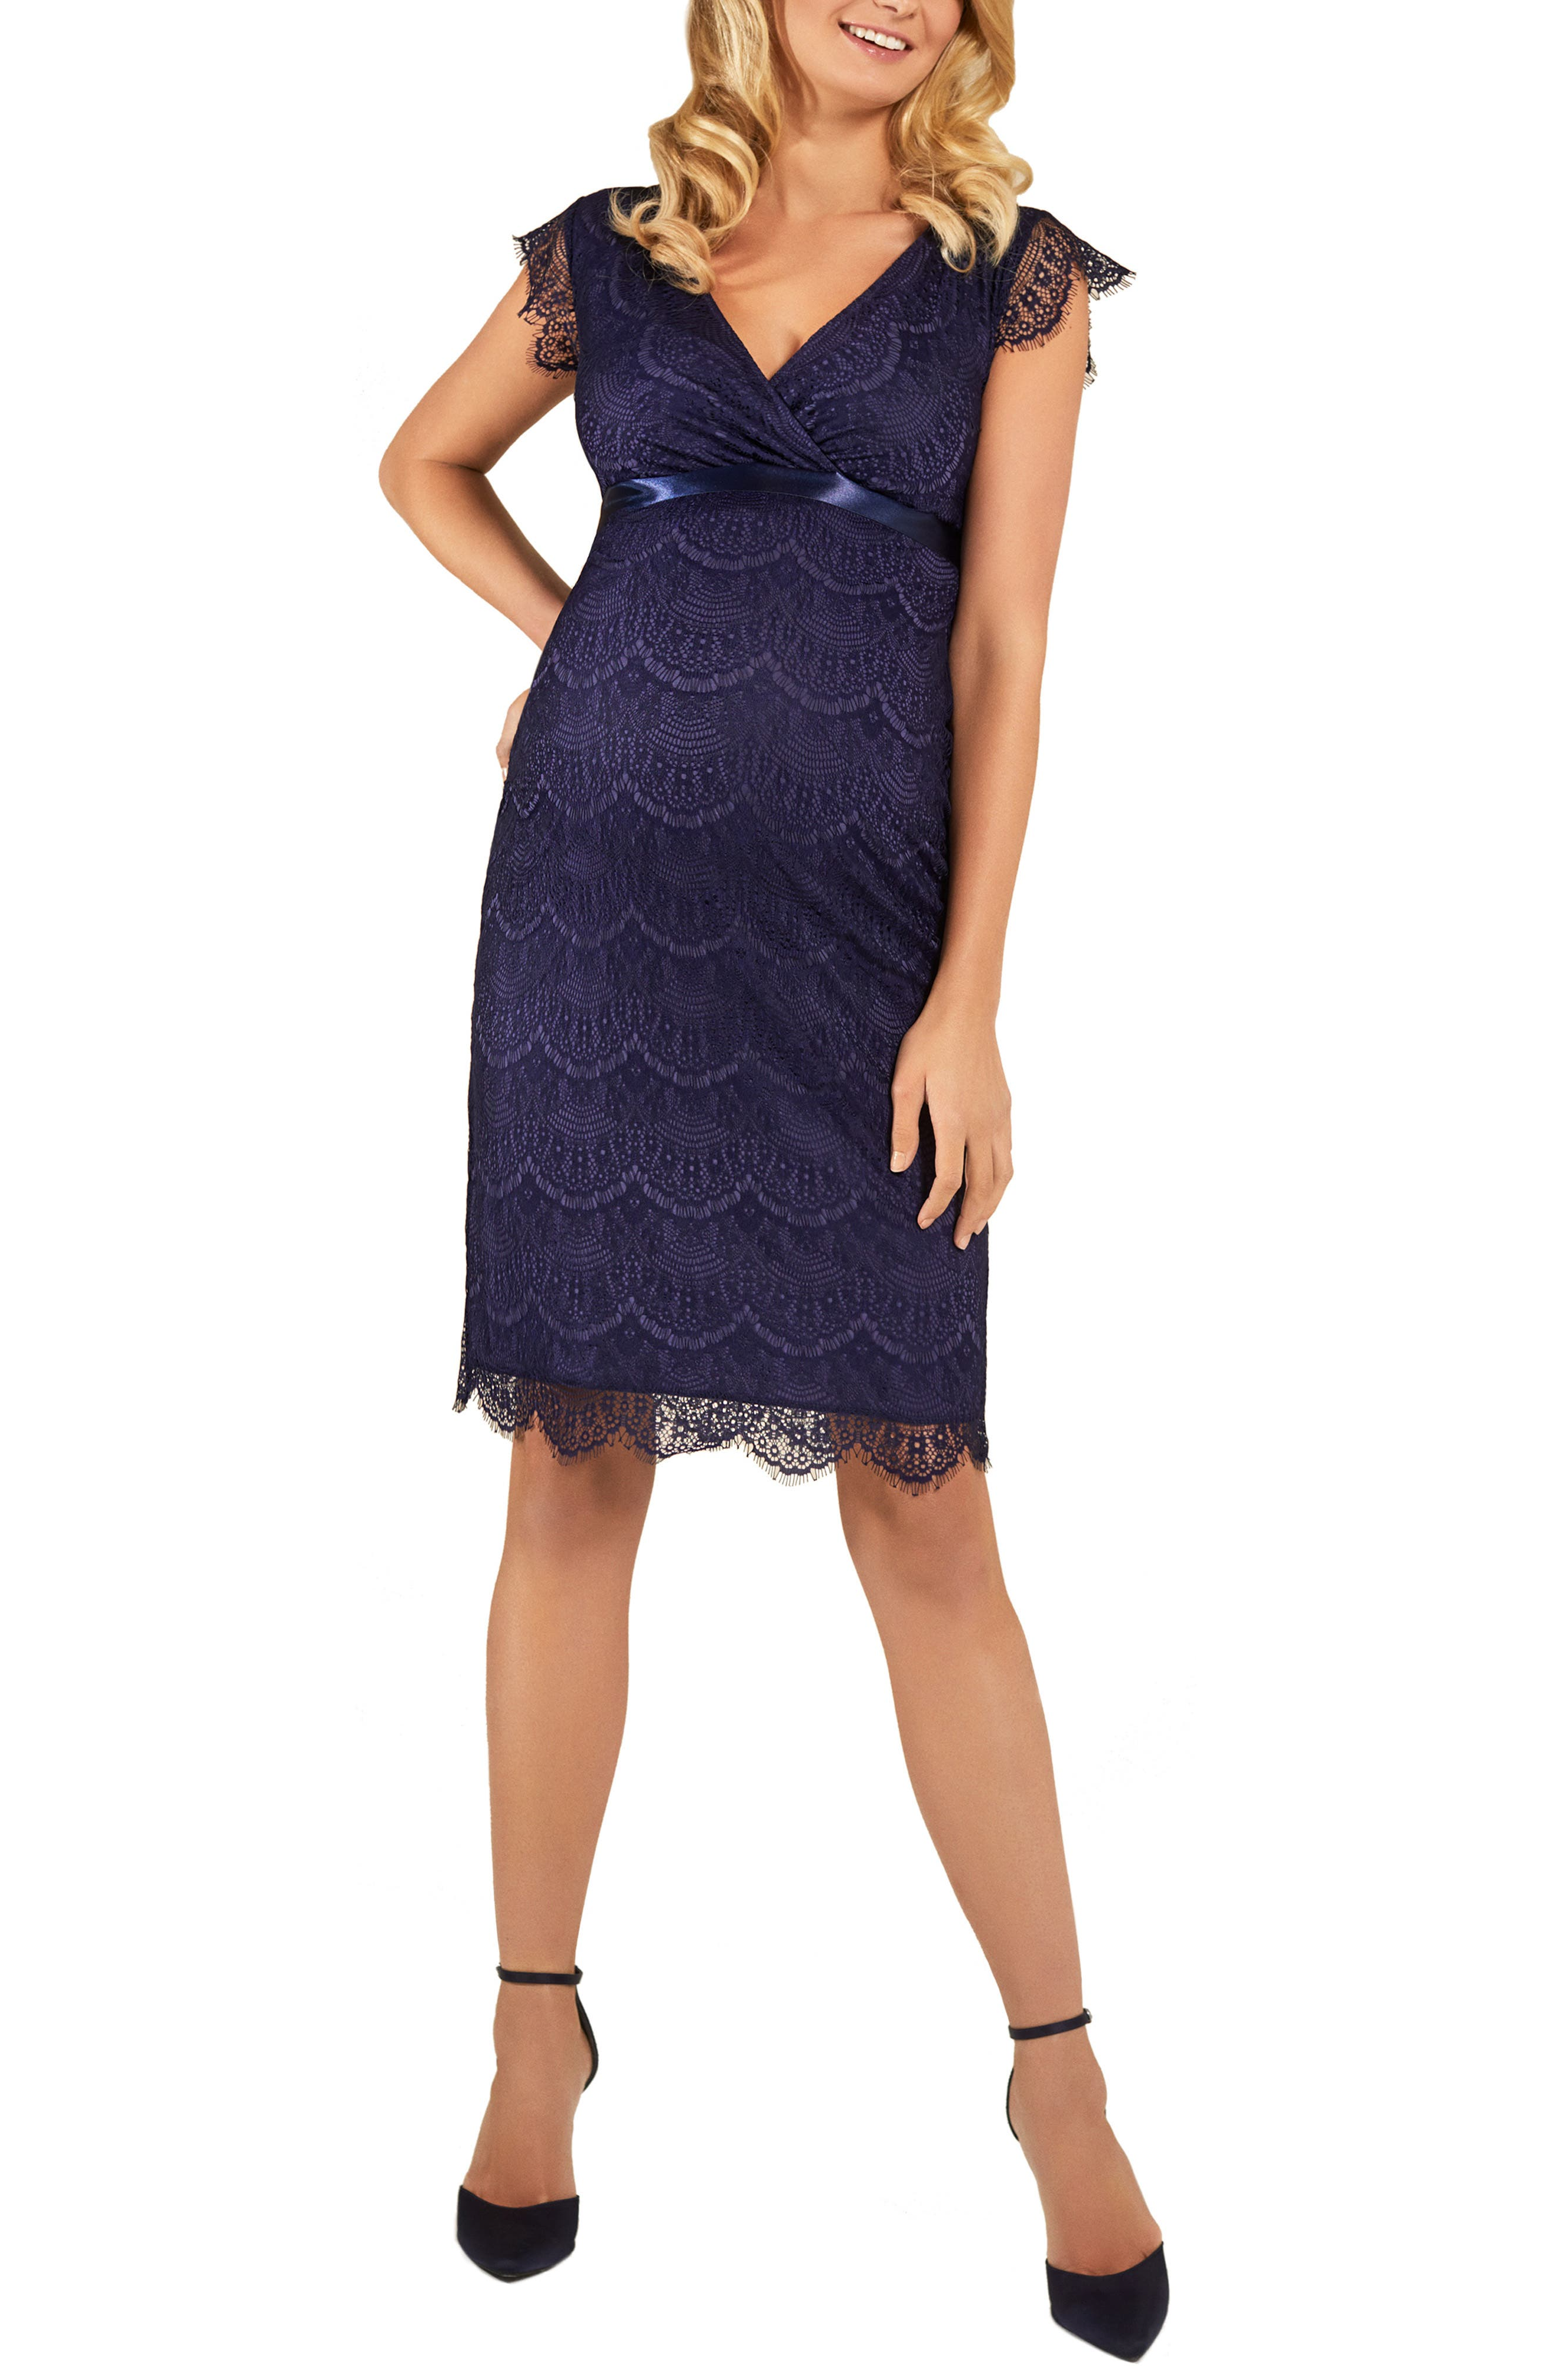 c971da5b626 Women s Tiffany Rose Maternity Dresses